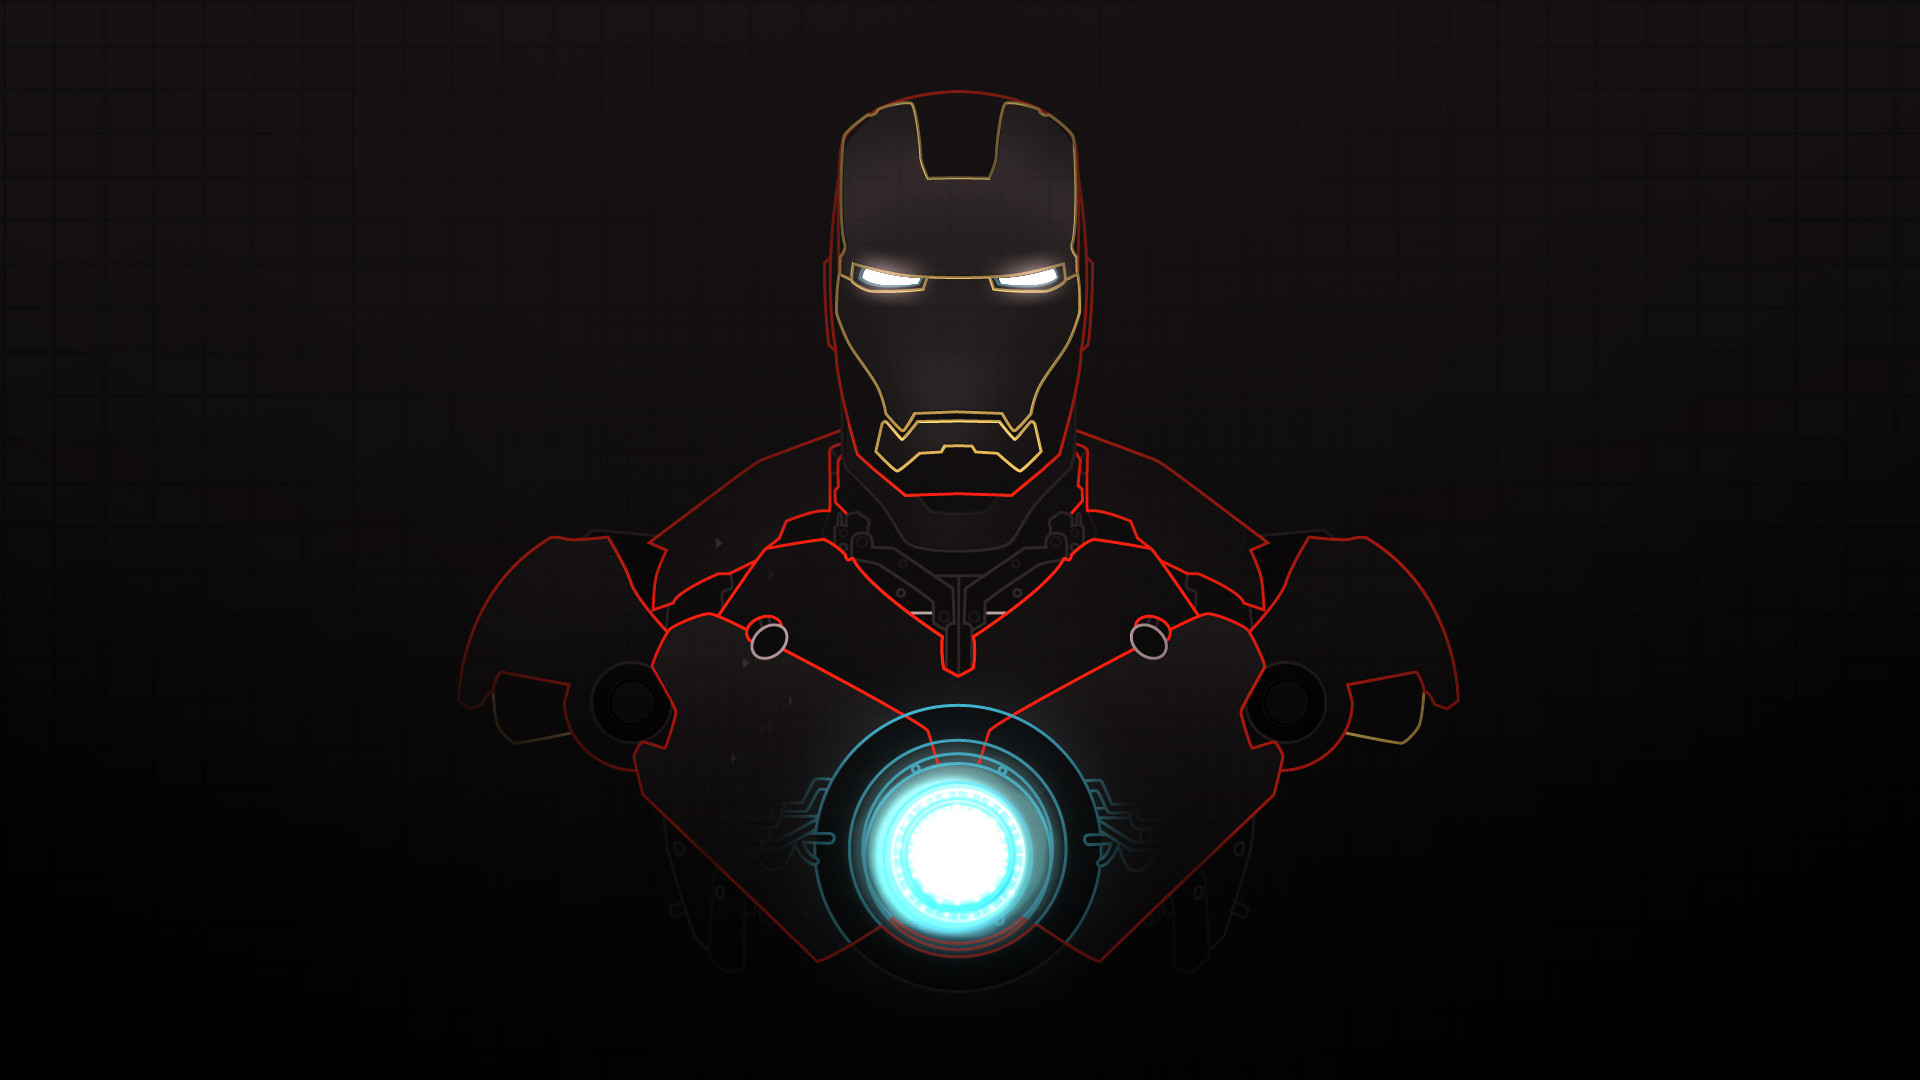 Wallpaper Abyss Explore the Collection Iron Man Comics Iron Man 282535 1920x1080